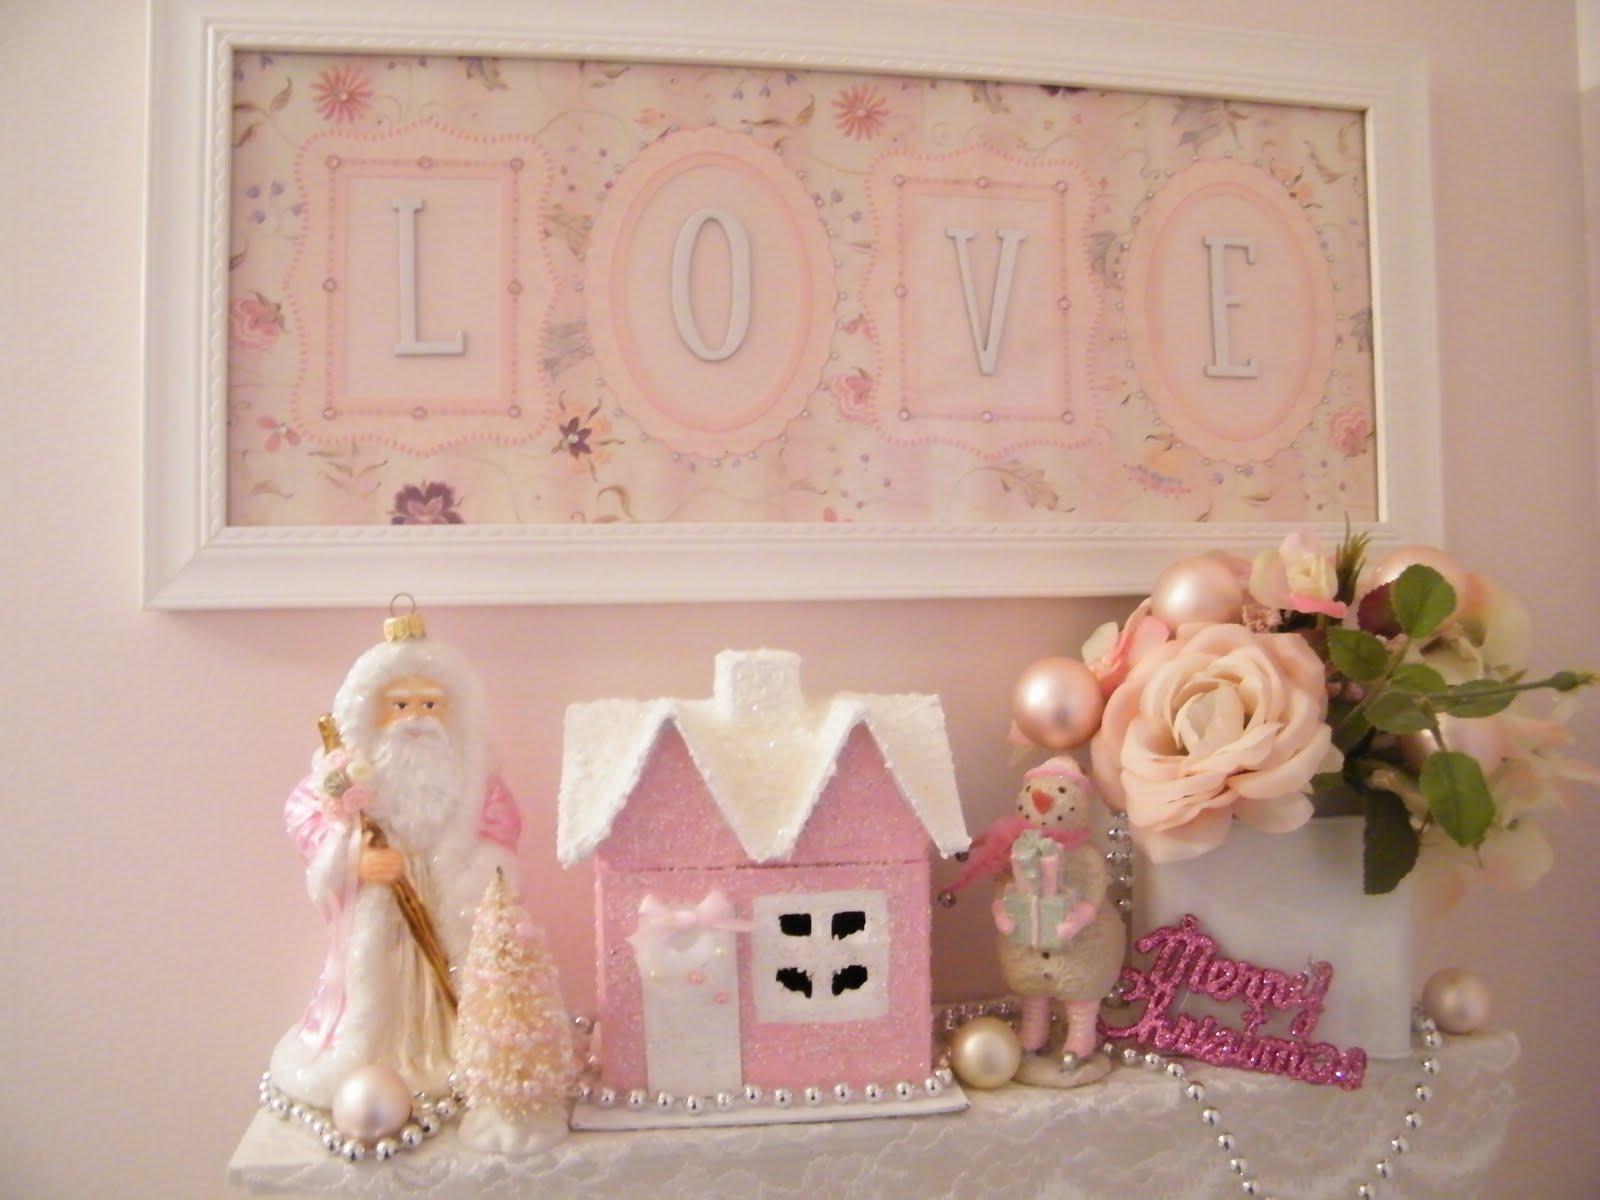 tammy's heart: my christmas cottage bathroom